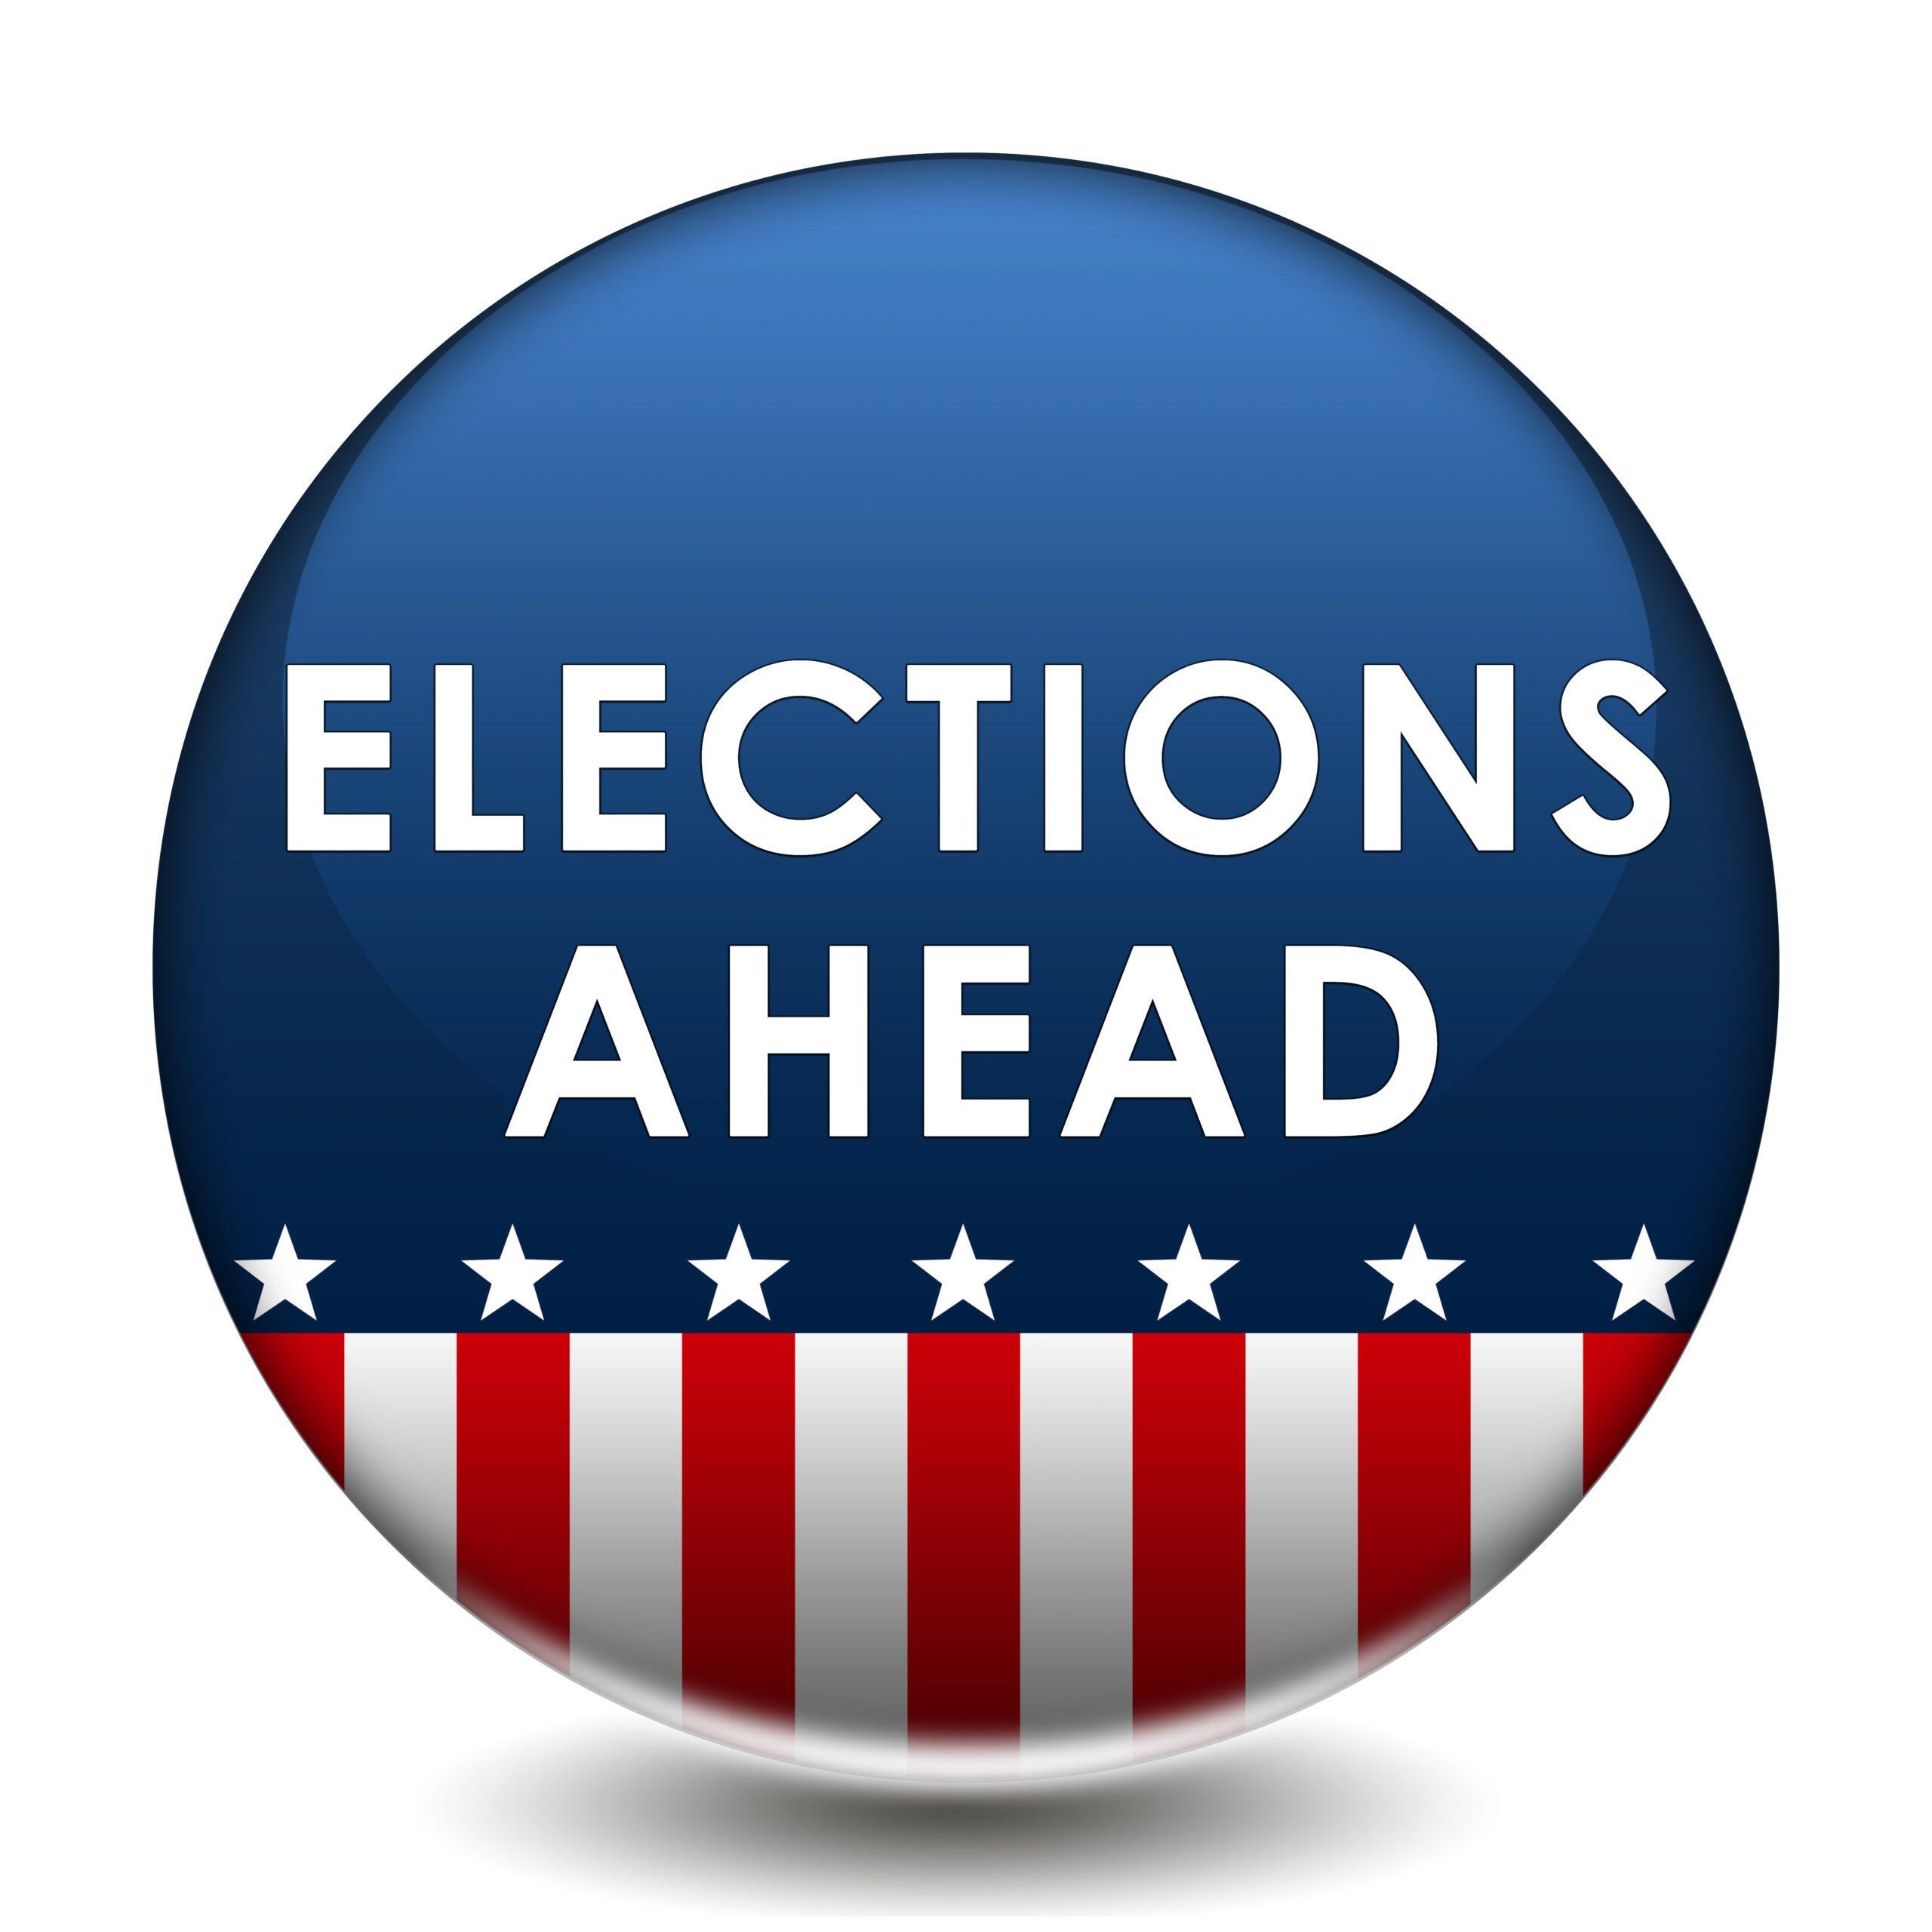 Election Ahead - vote badge